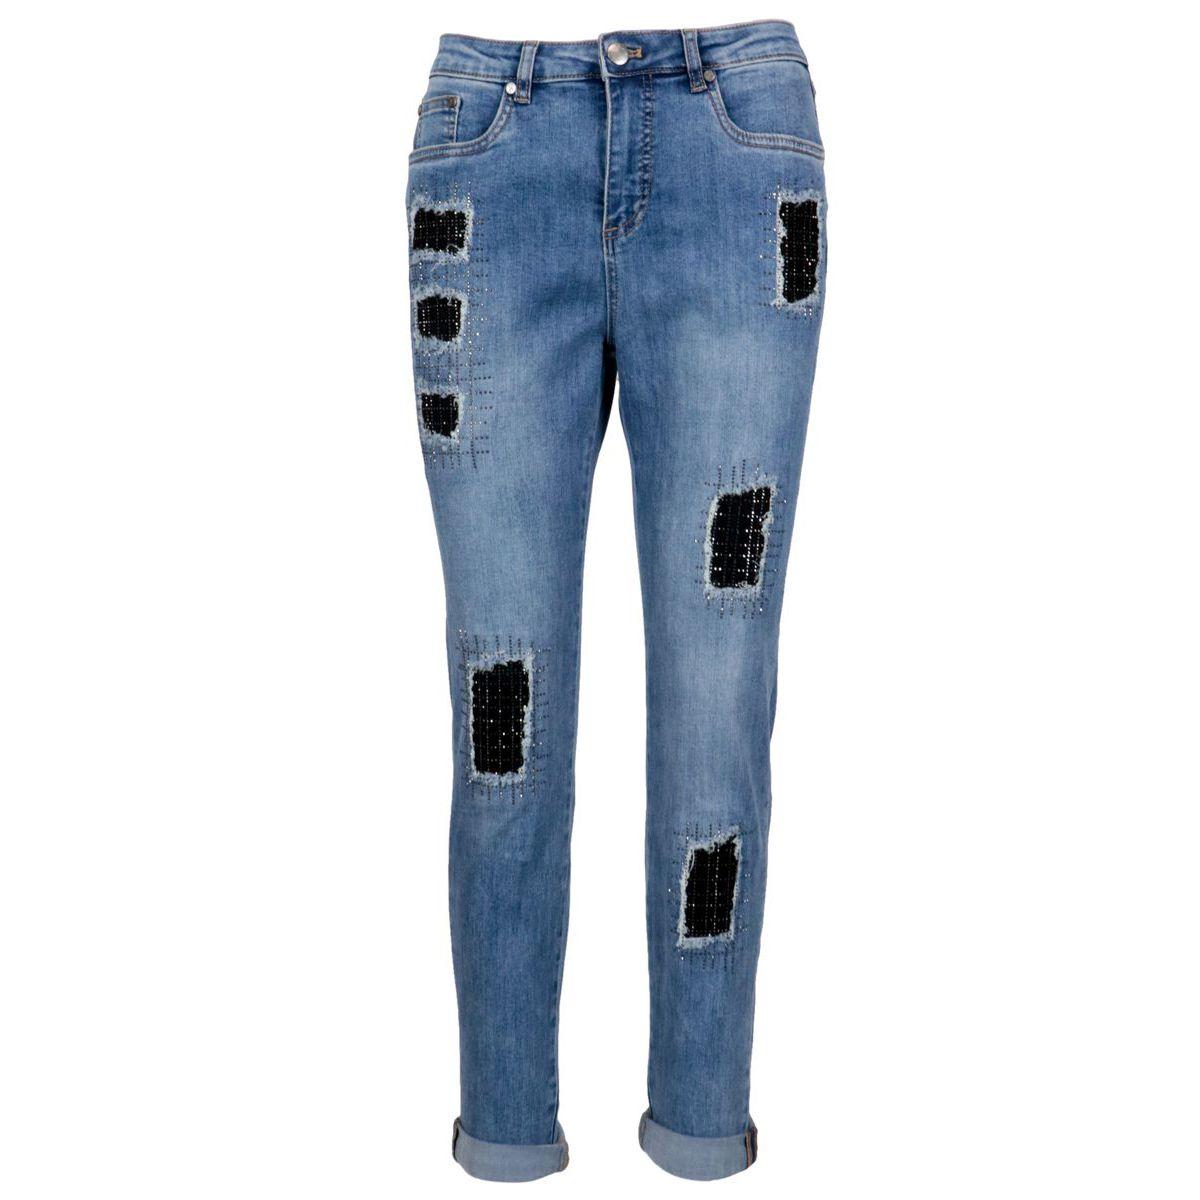 Slim jeans with contrasting fabric inserts Blue / denim Joseph Ribkoff